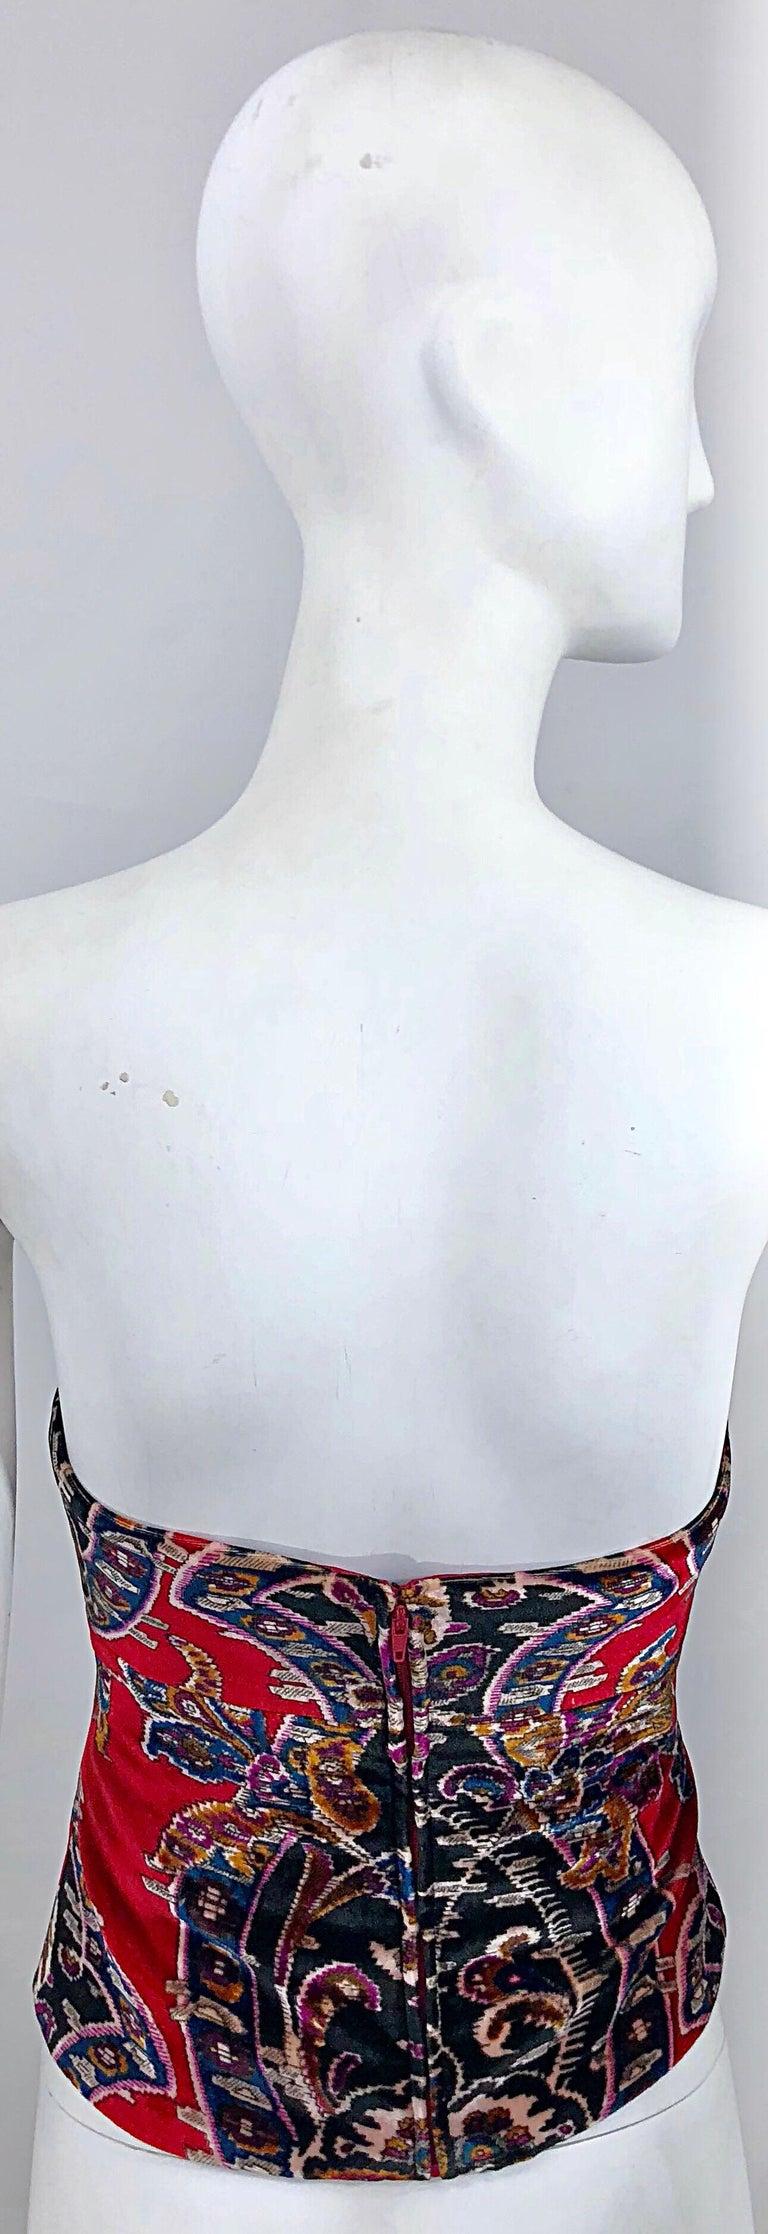 ef31eb5d4b8ca Black Vintage Lillie Rubin 1990s Size 2 / 4 Red Velvet Tapestry Strapless Bustier  Top For